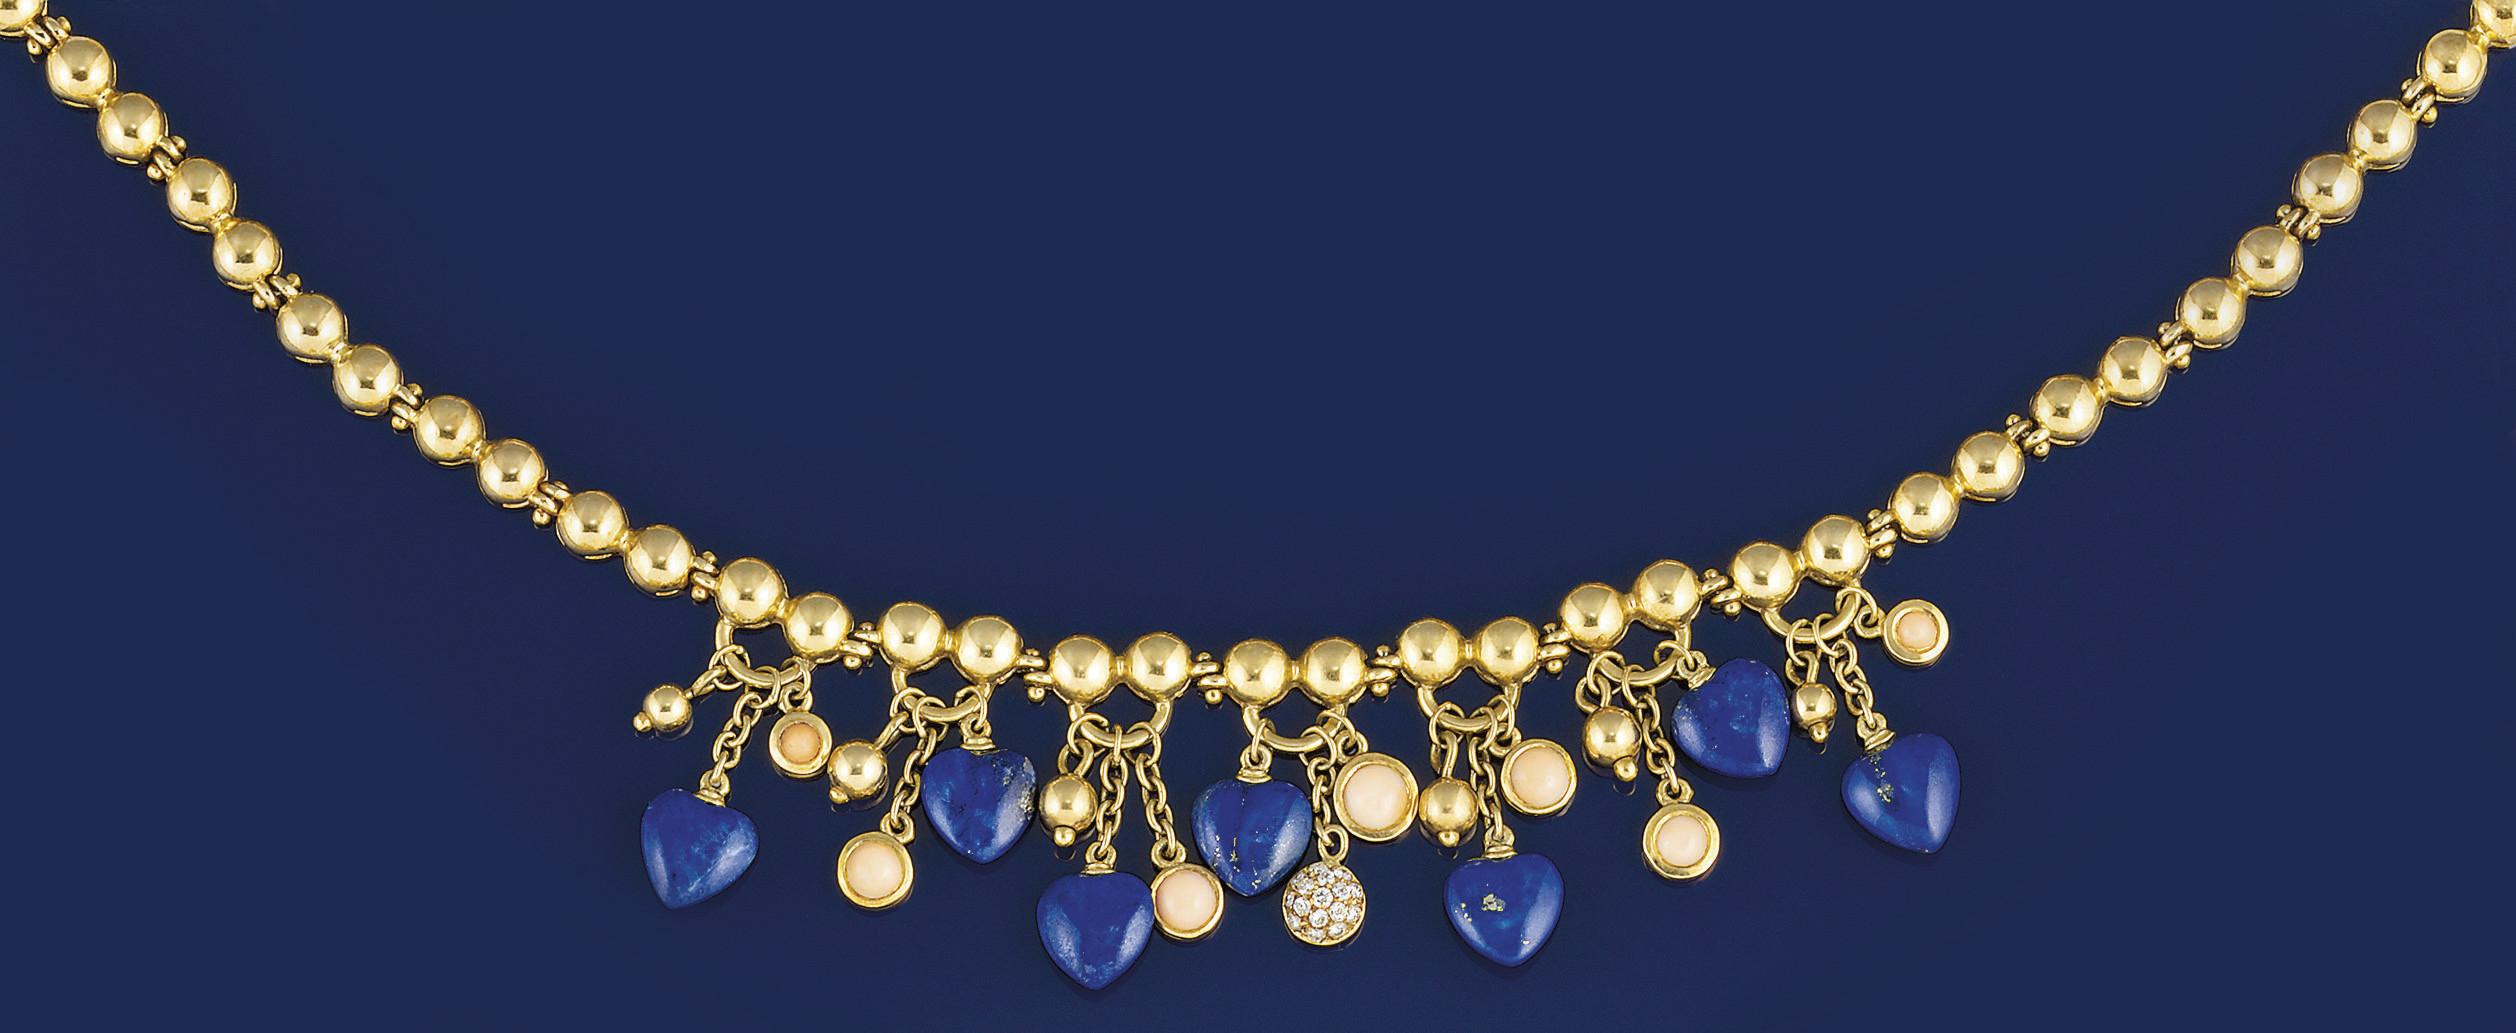 A lapis lazuli, coral, and dia